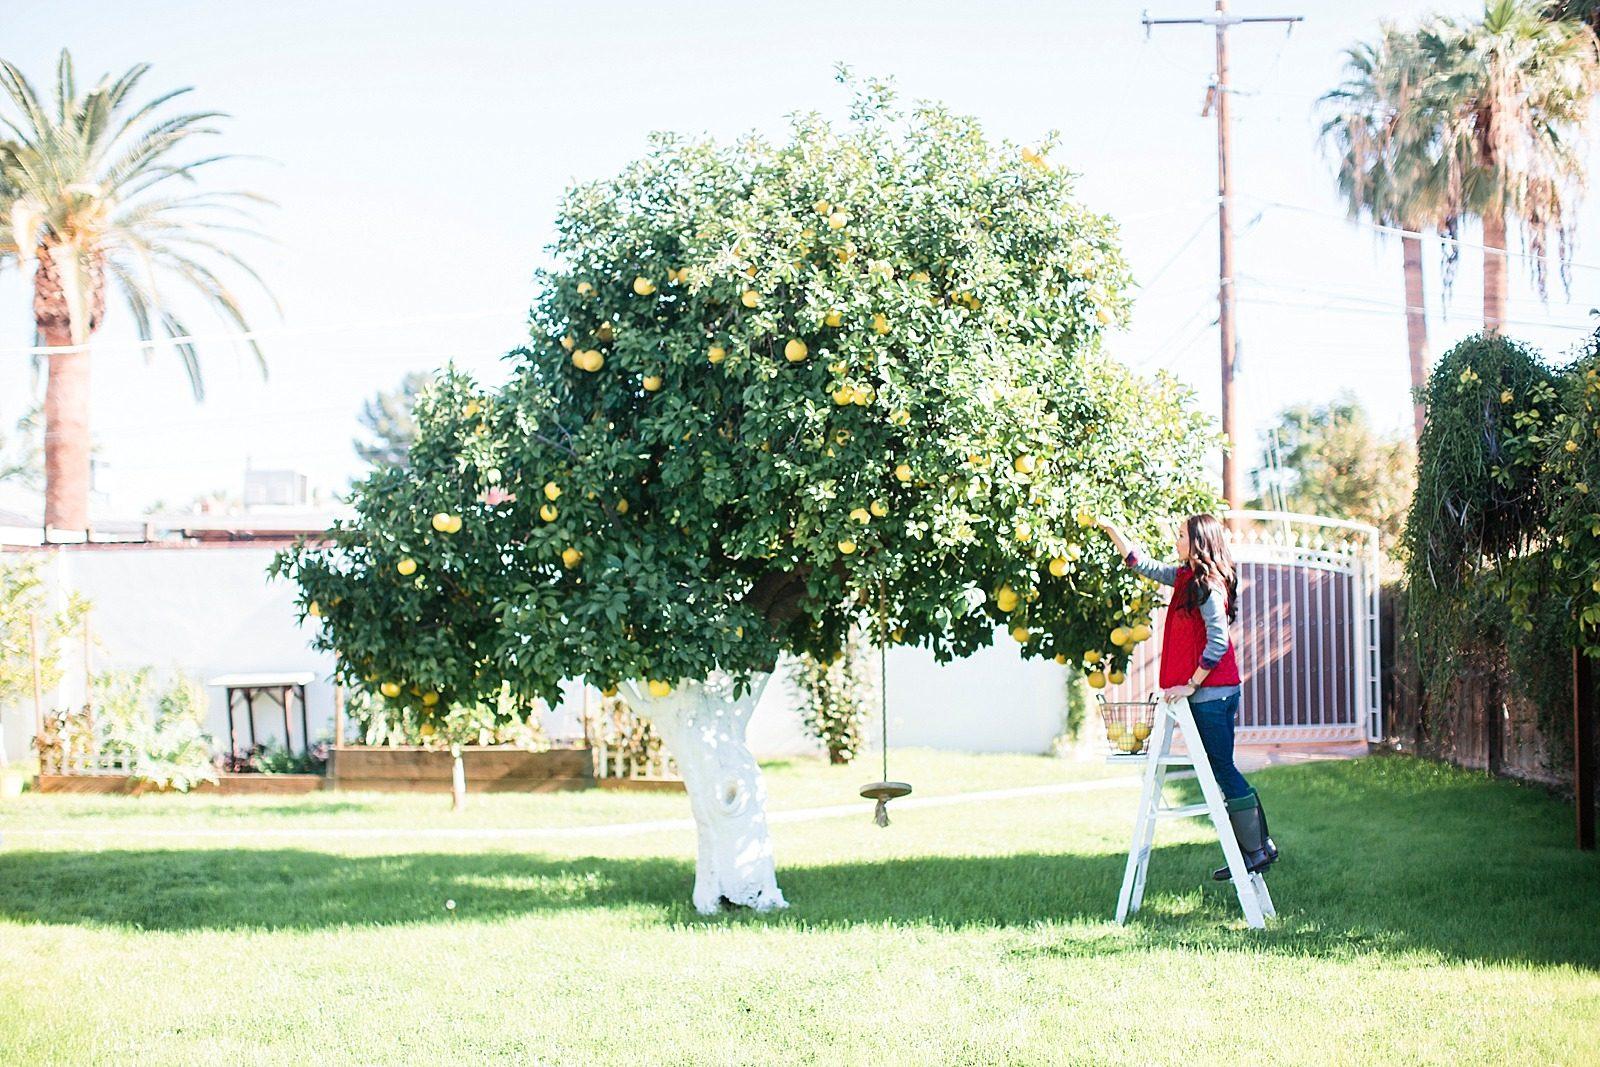 grapefruit tree picking girl on ladder